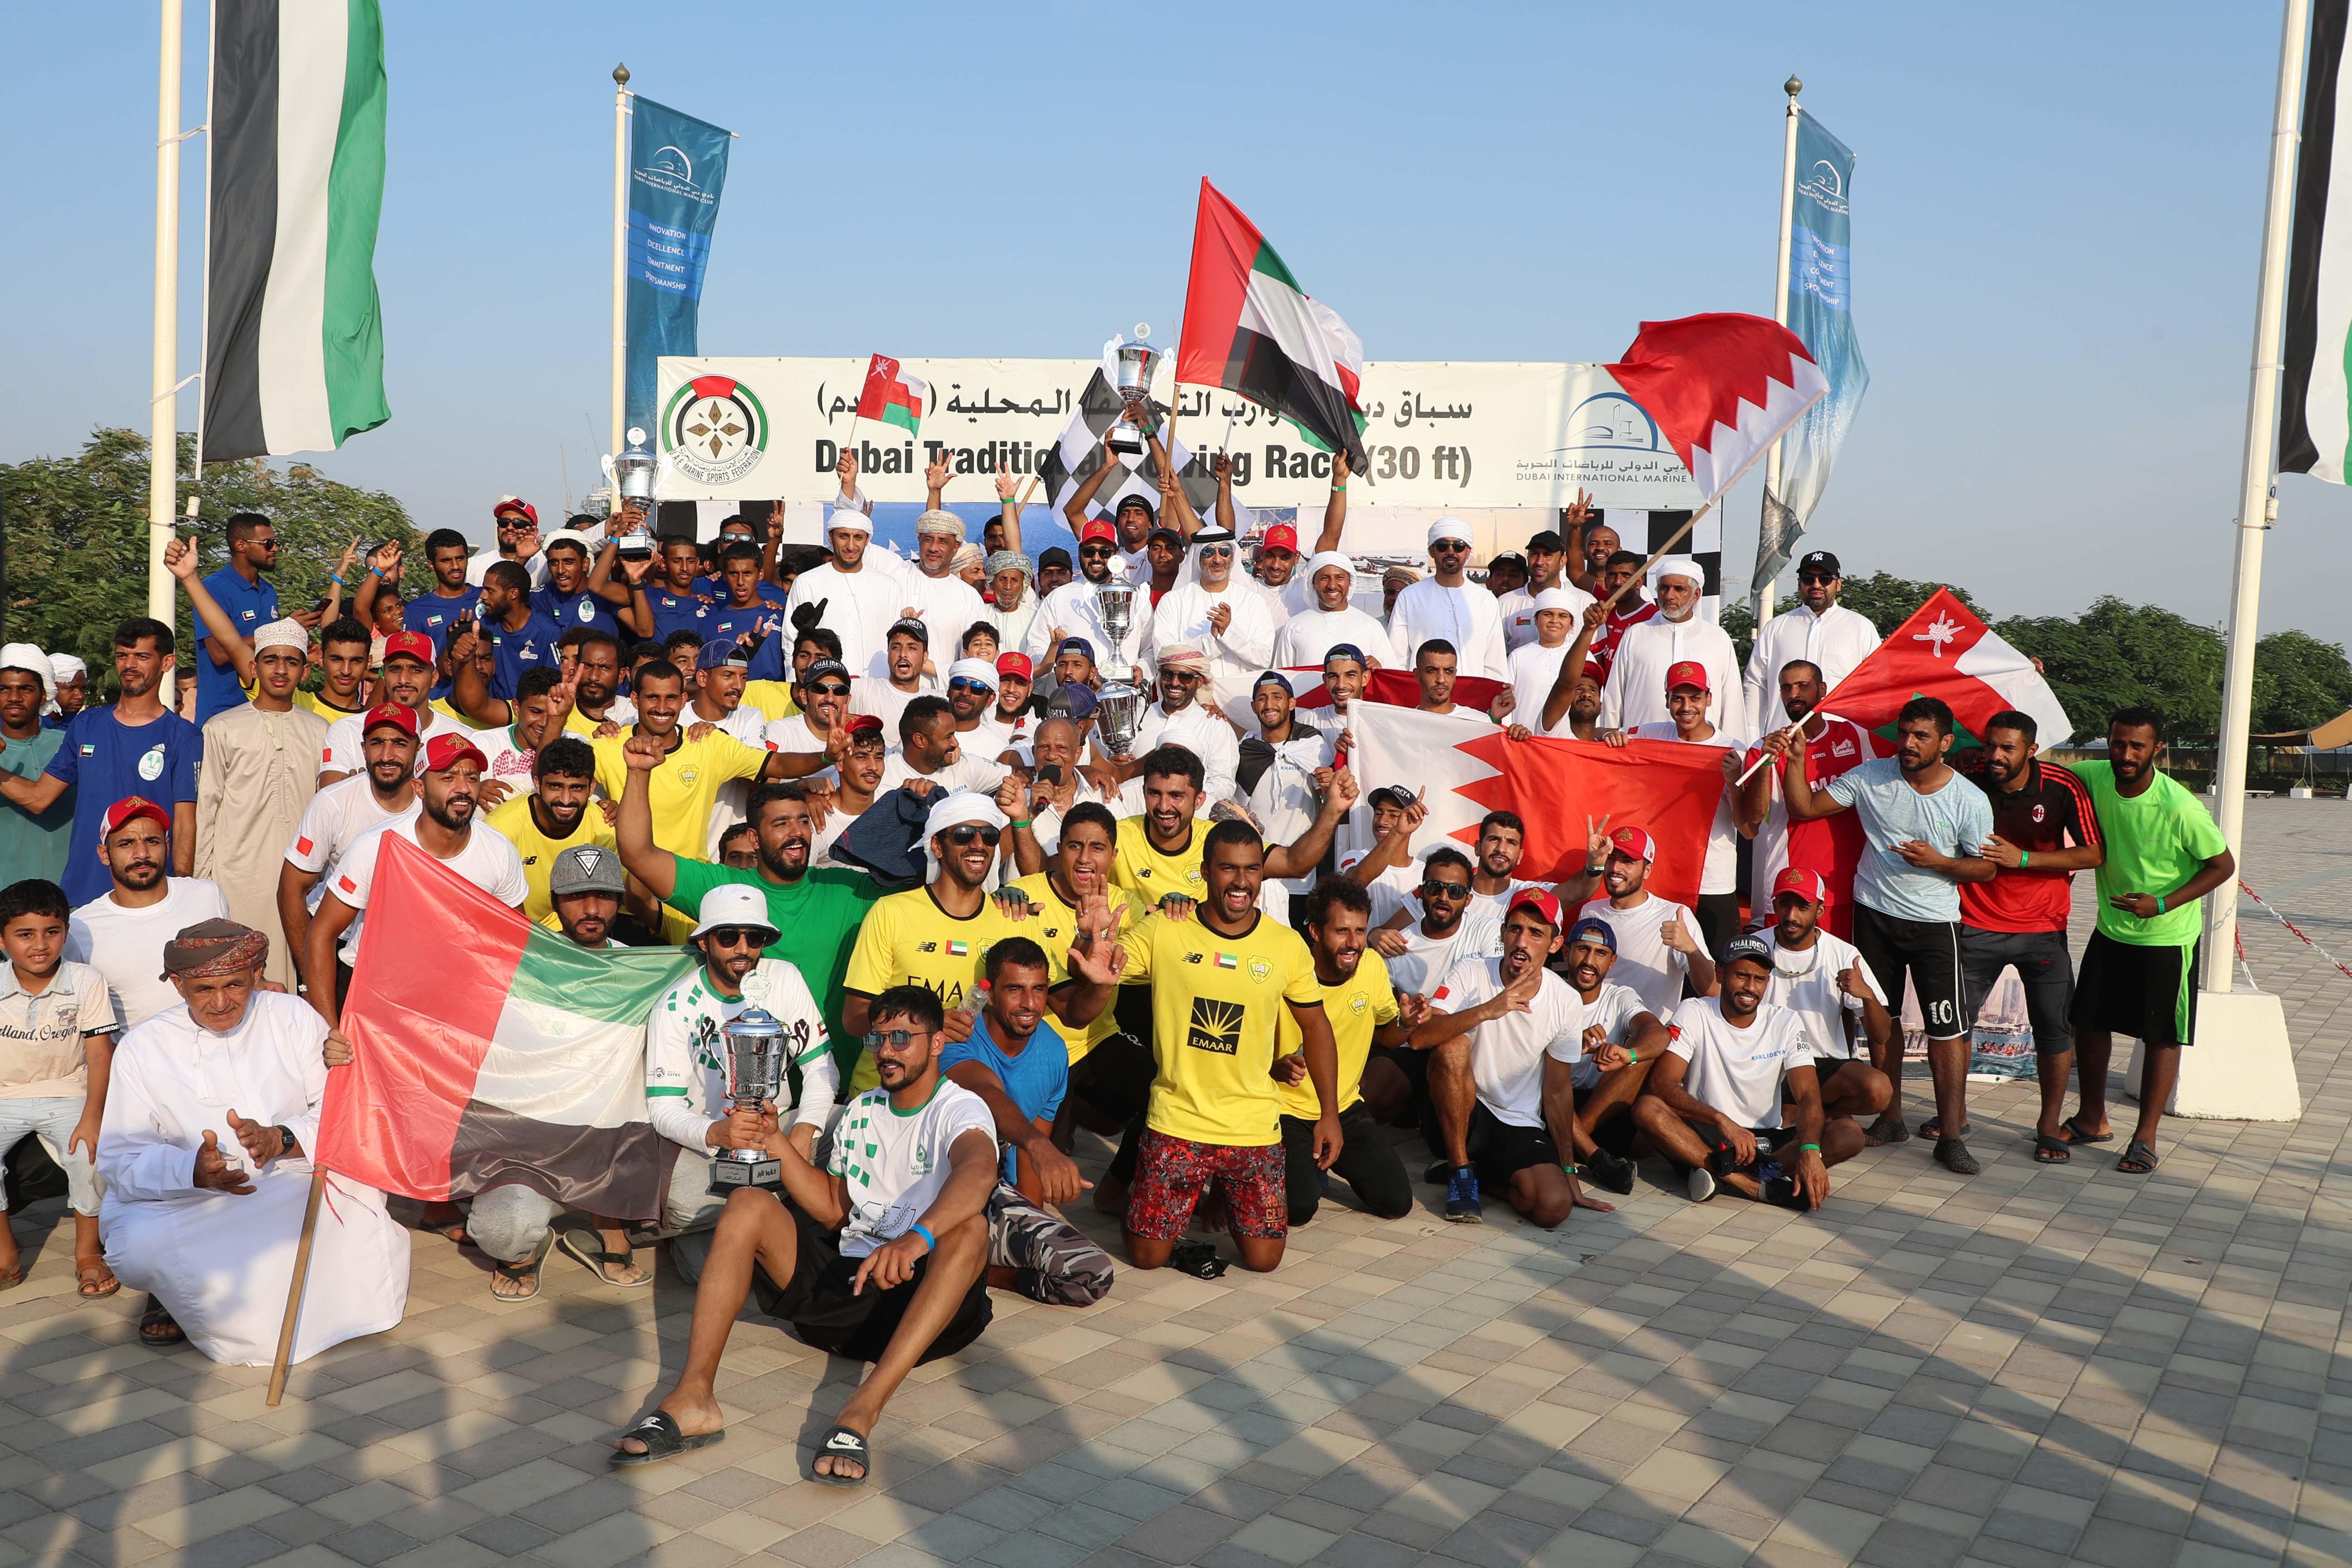 Bahrain and Oman boats Tops the Dubai Rowing Race